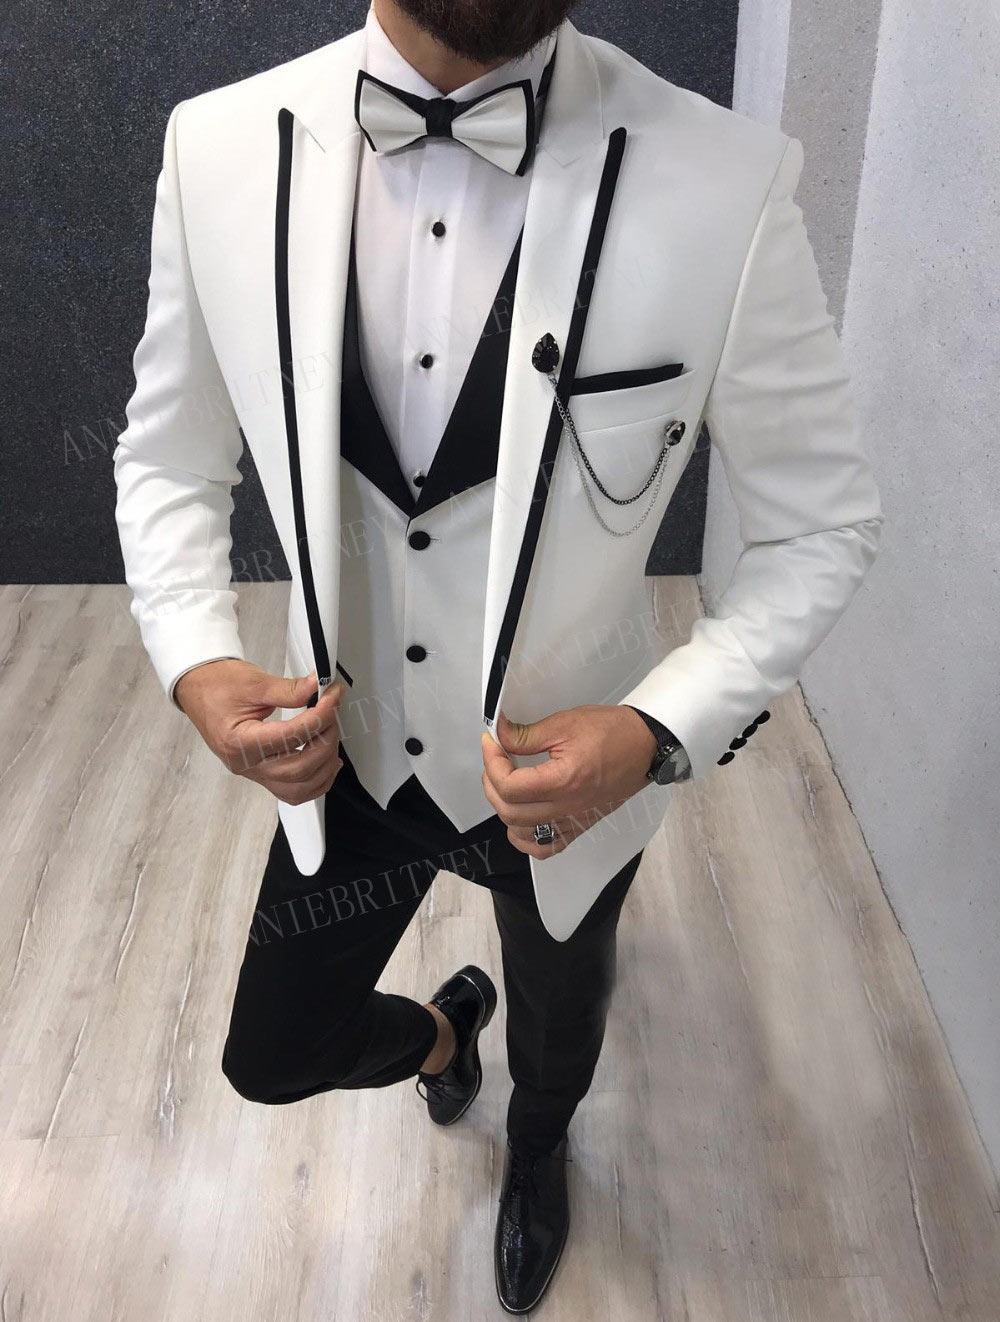 ANNIEBRITNEY 2019 Customize Peak Lapel Groom Tuxedos Formal Men Wedding Suits Prom Best Man Blazer Pants Fashion Male Suit Set